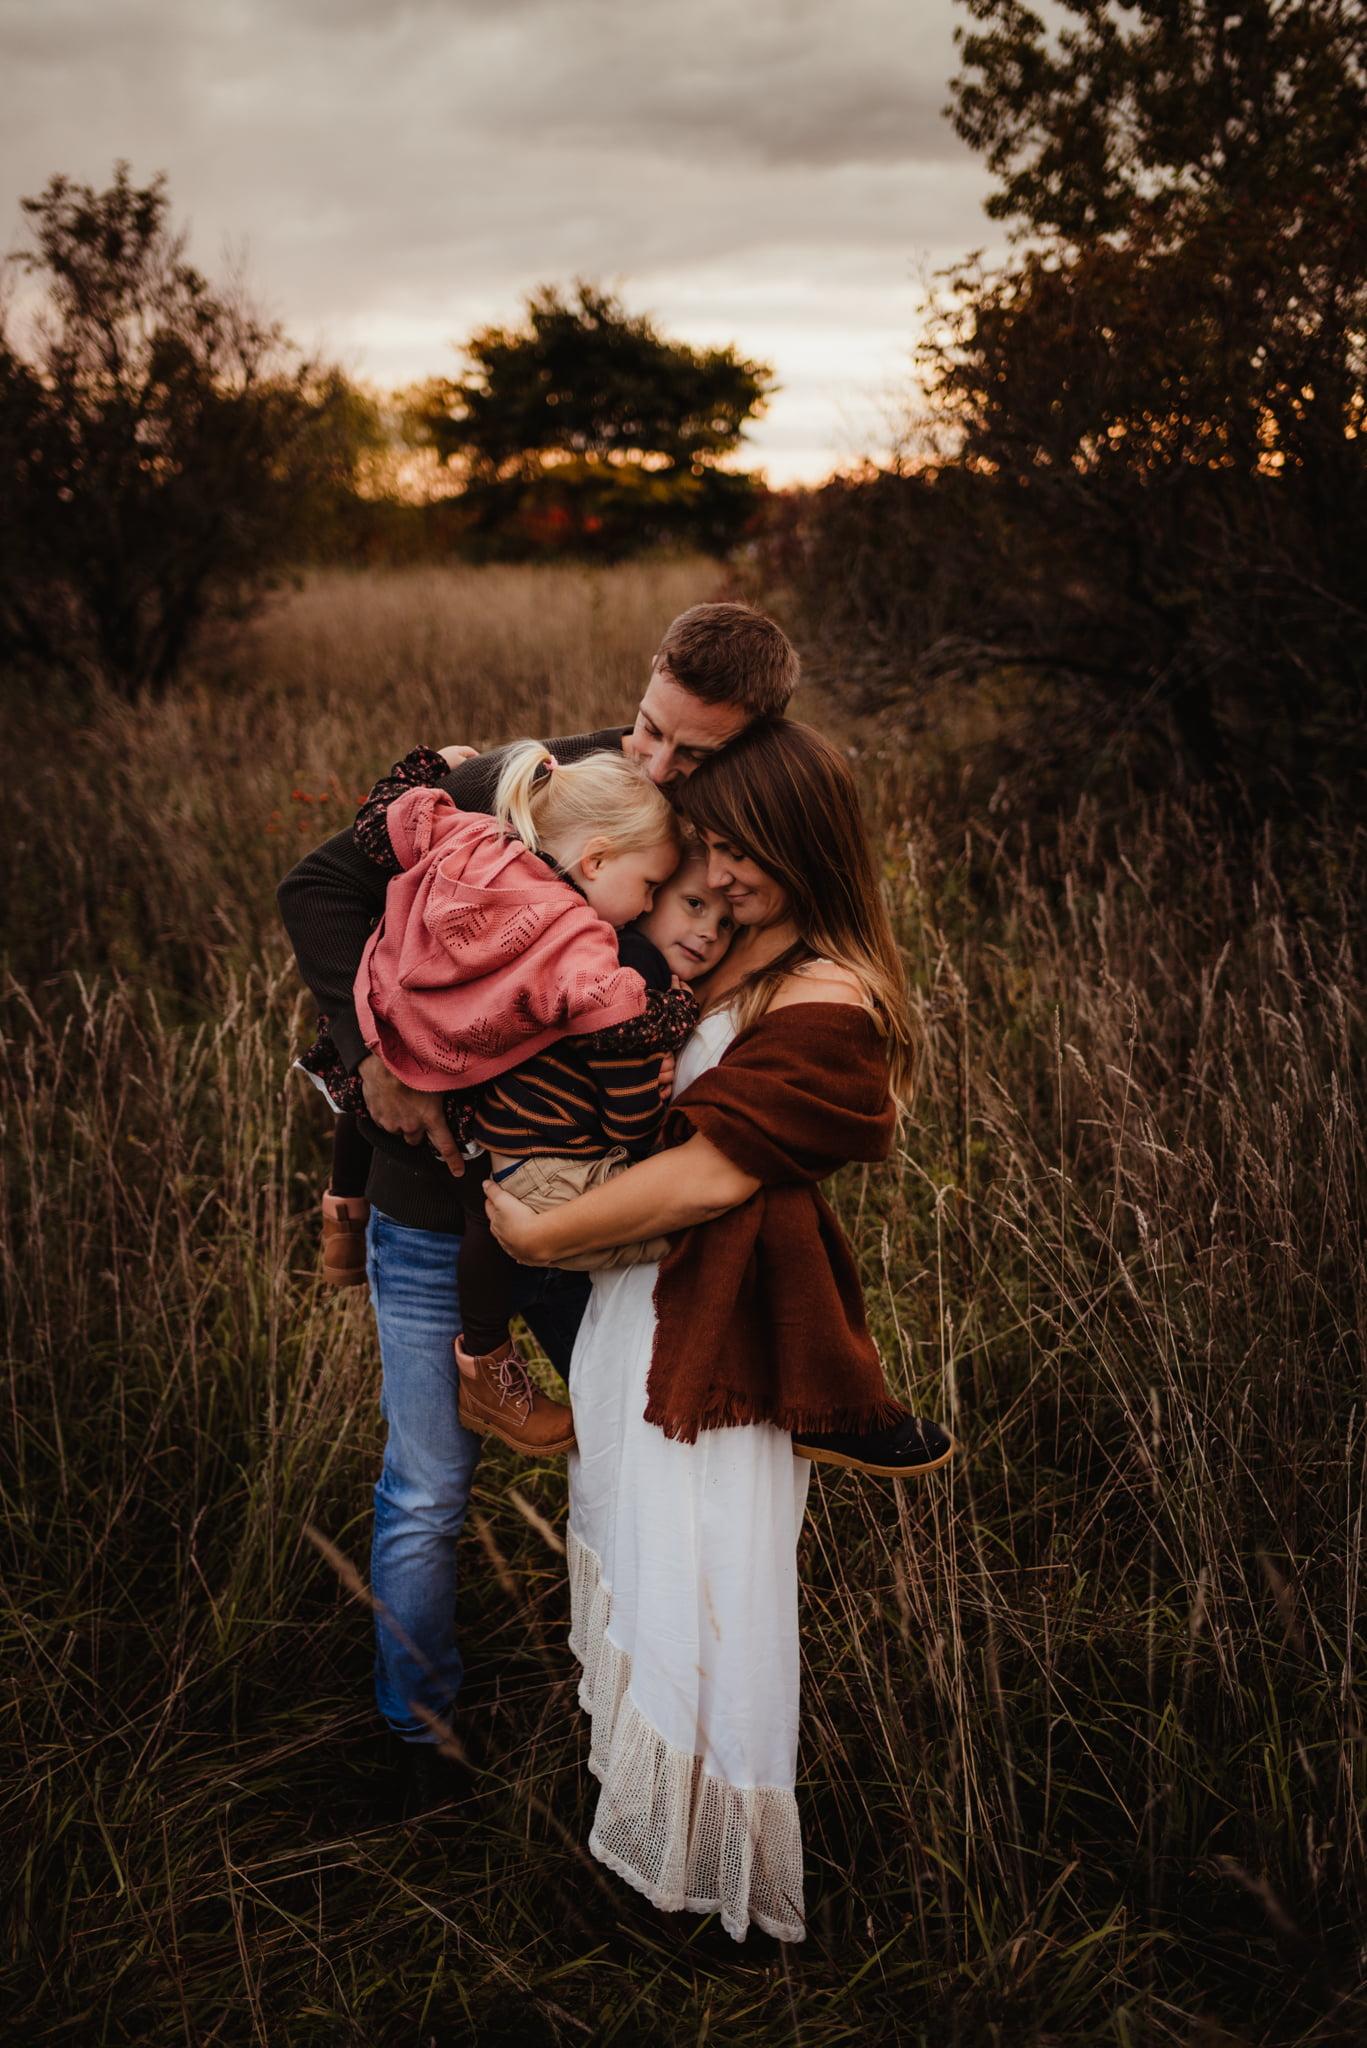 Marklund - Familjefotografering 3